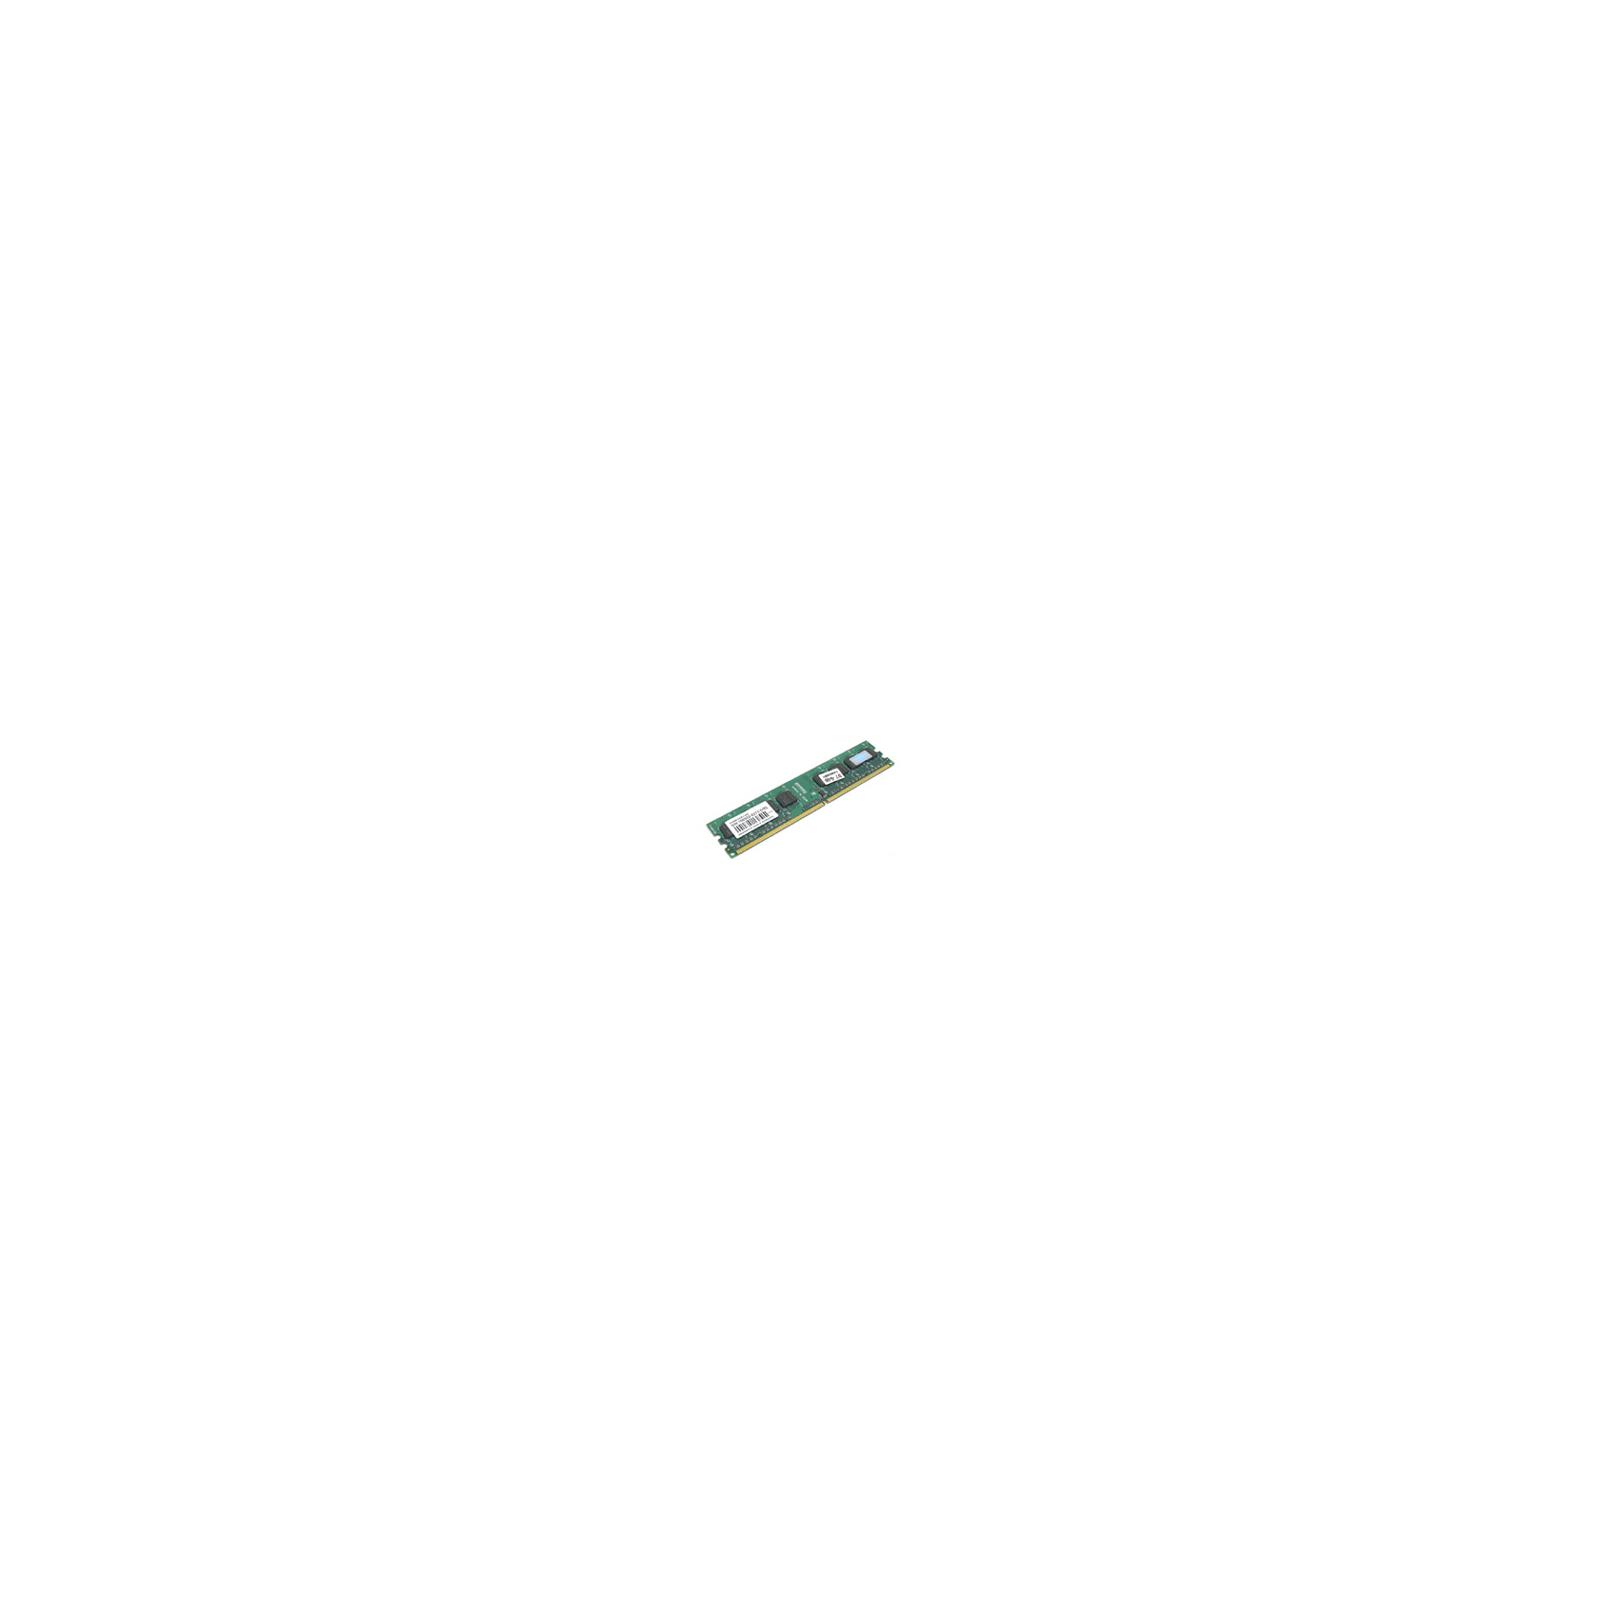 Модуль памяти для компьютера DDR2 1GB 800 MHz Transcend (JM800QLU-1G)